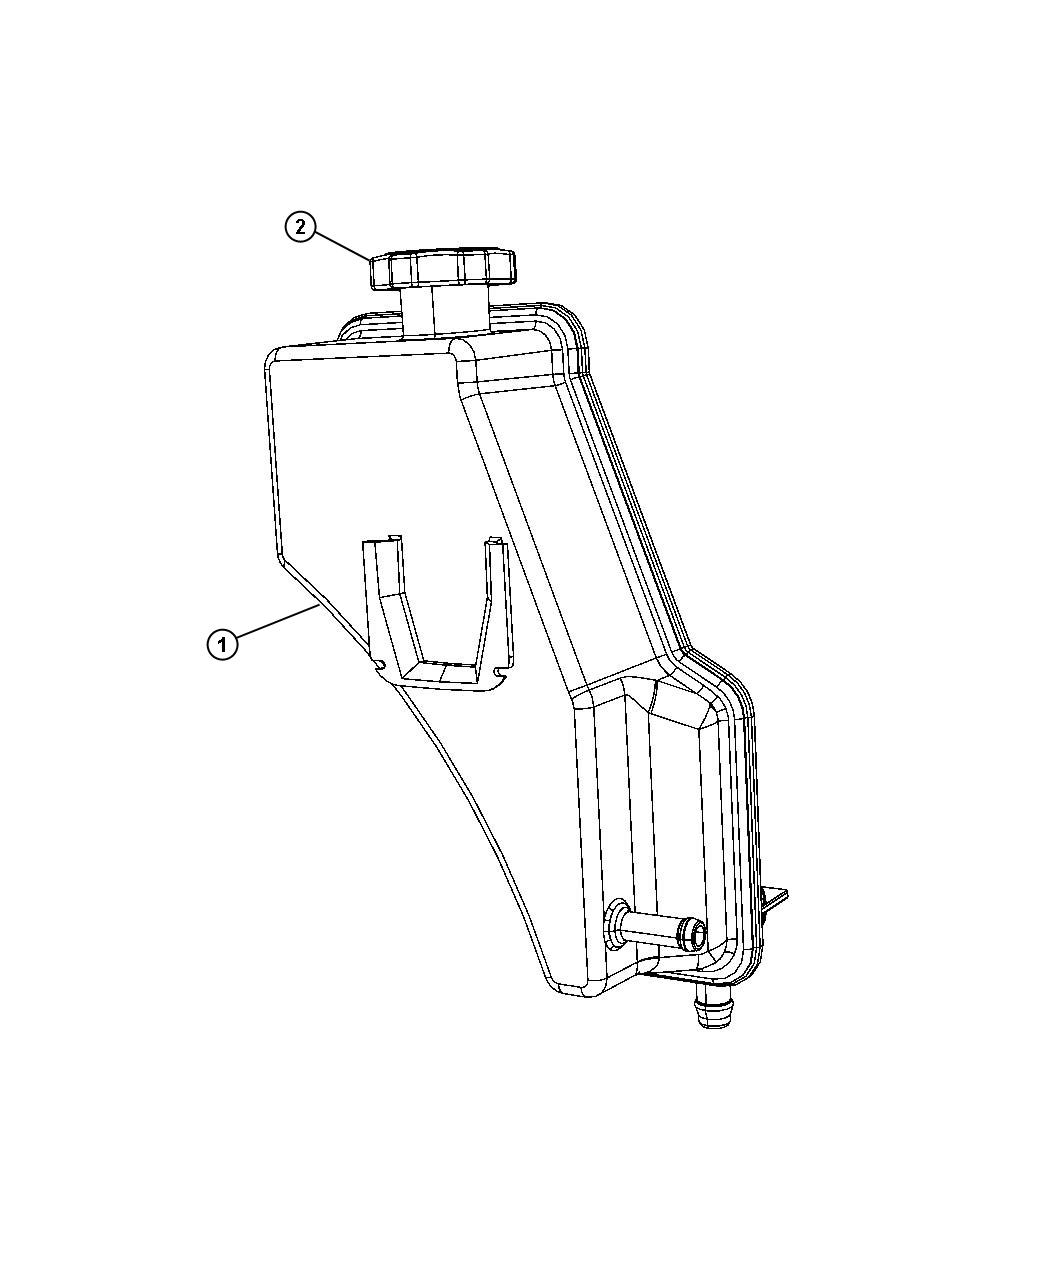 2008 jeep commander reservoir  power steering fluid   hydraulic engine cooling